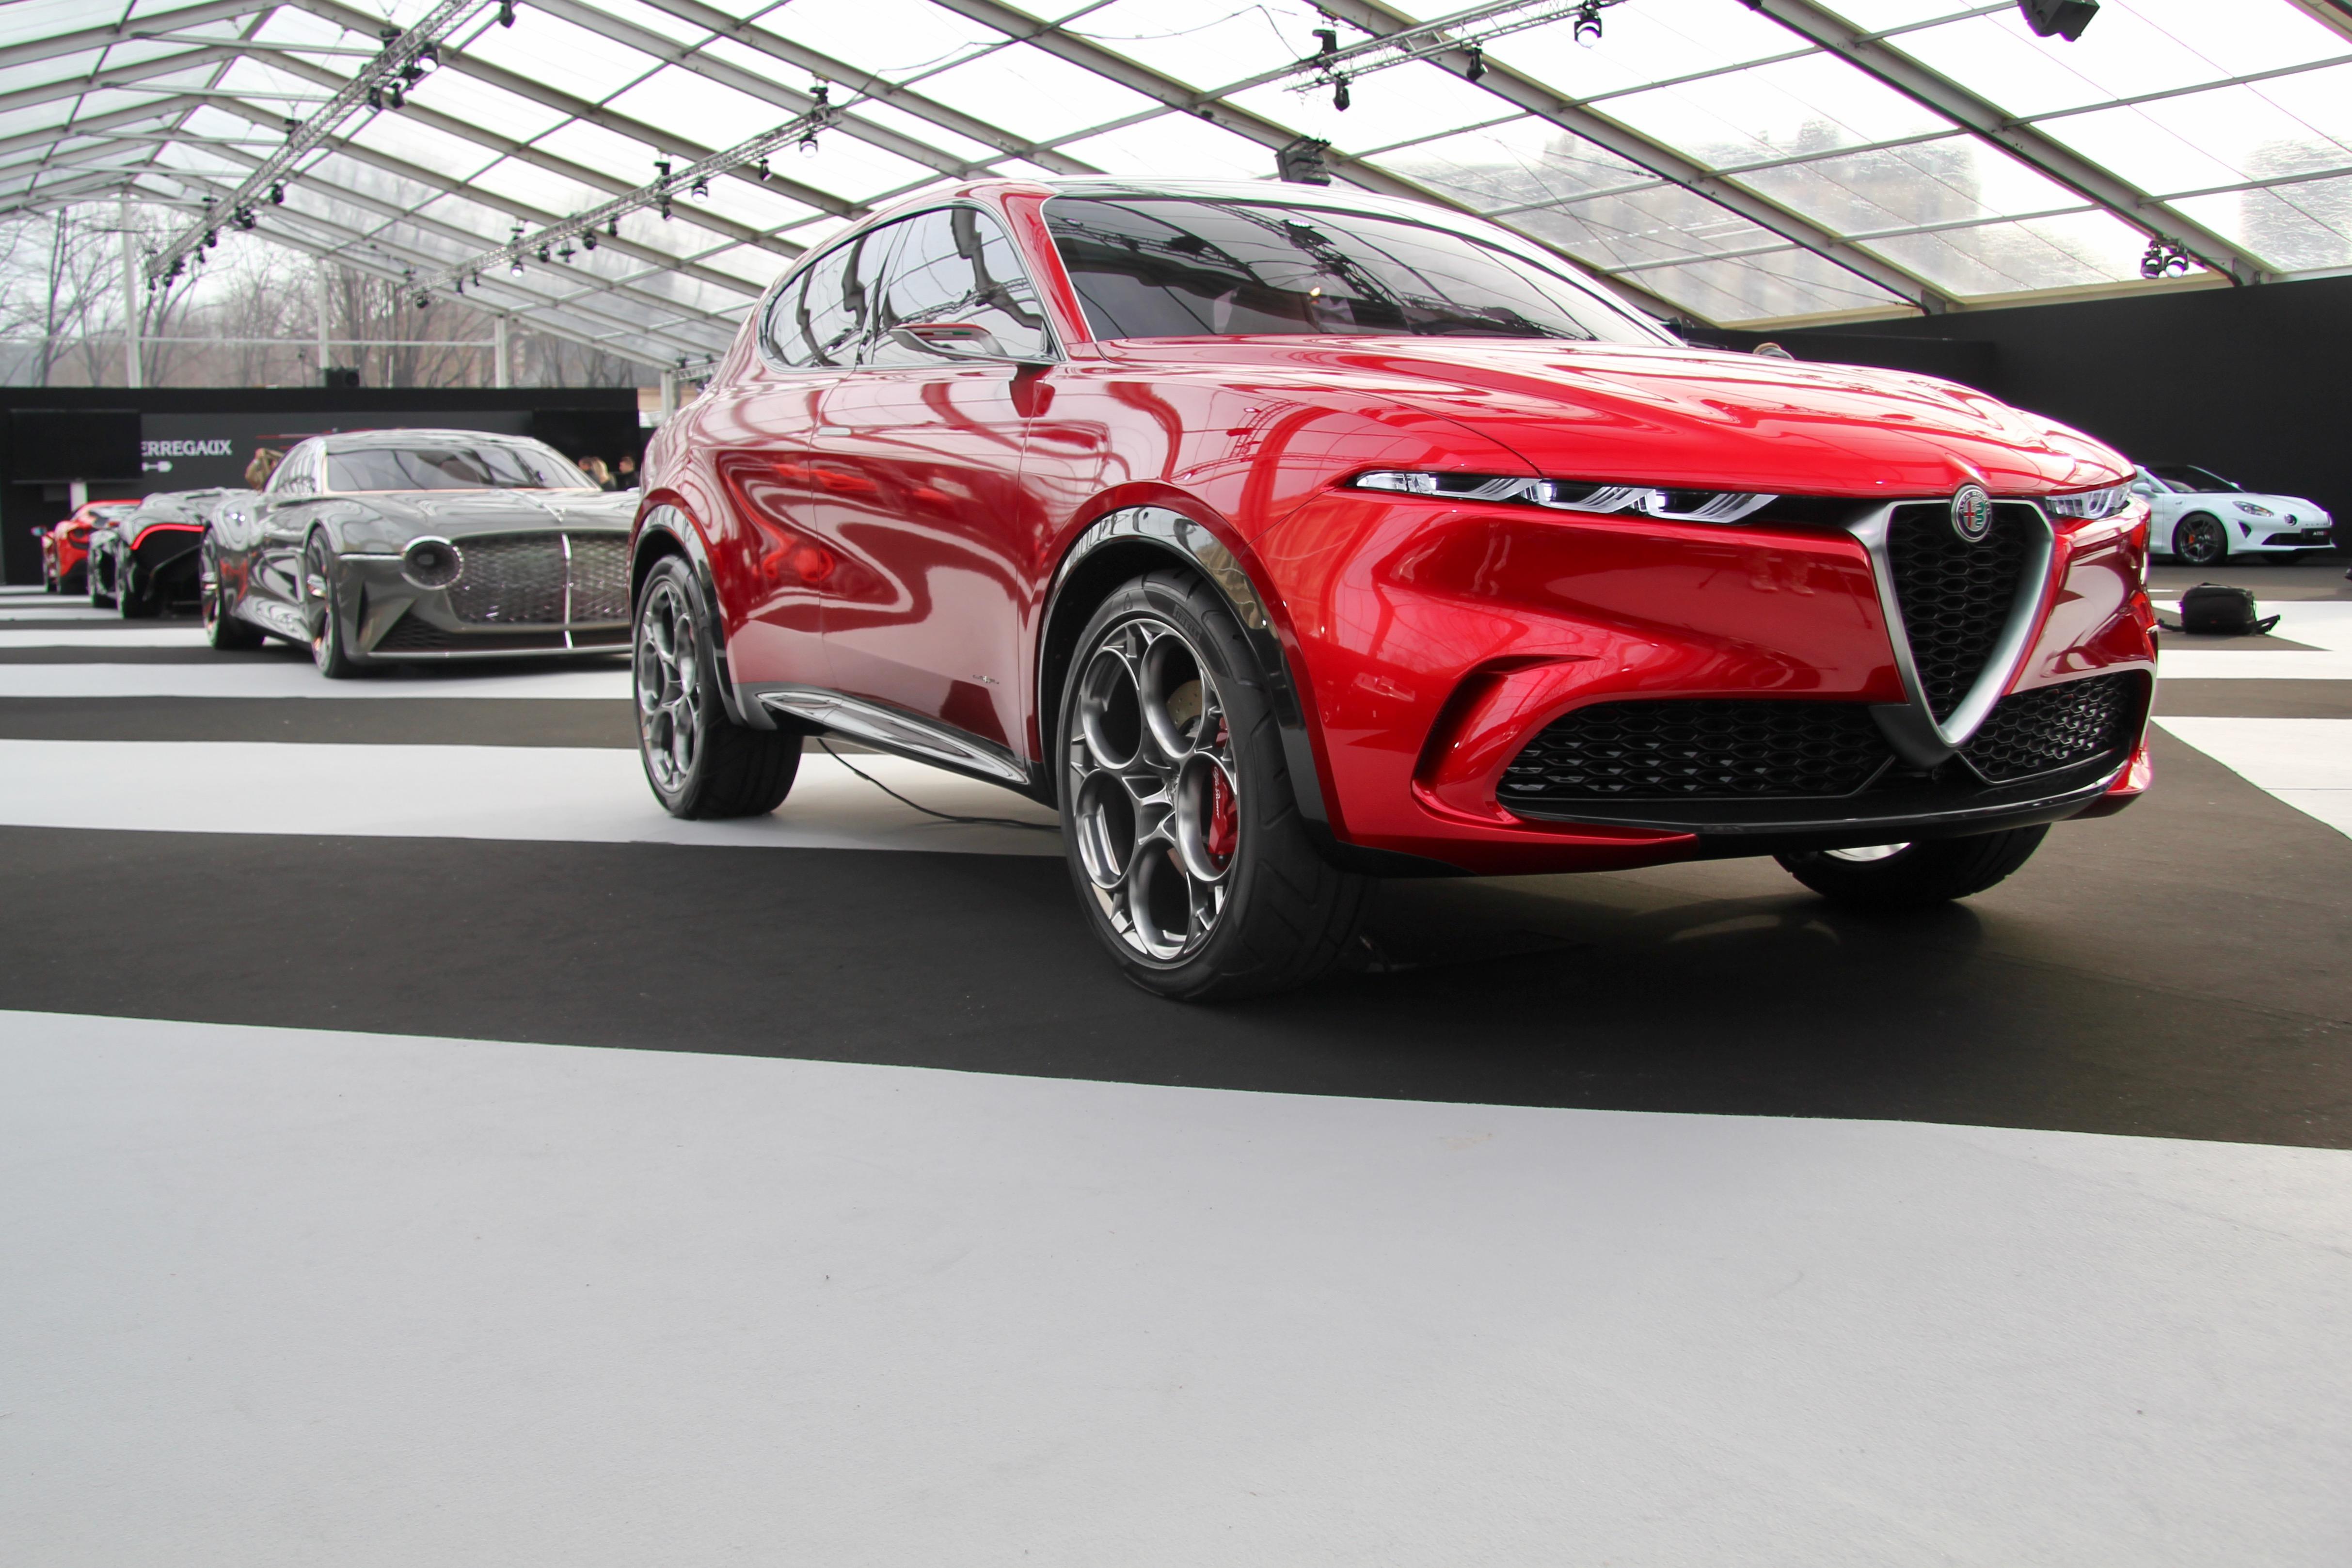 Alfa Romeo Tonale Concept - front face / face avant - Festival Automobile International - 2020 - exposition Concept Cars - Design Automobile - photo Ludo Ferrari